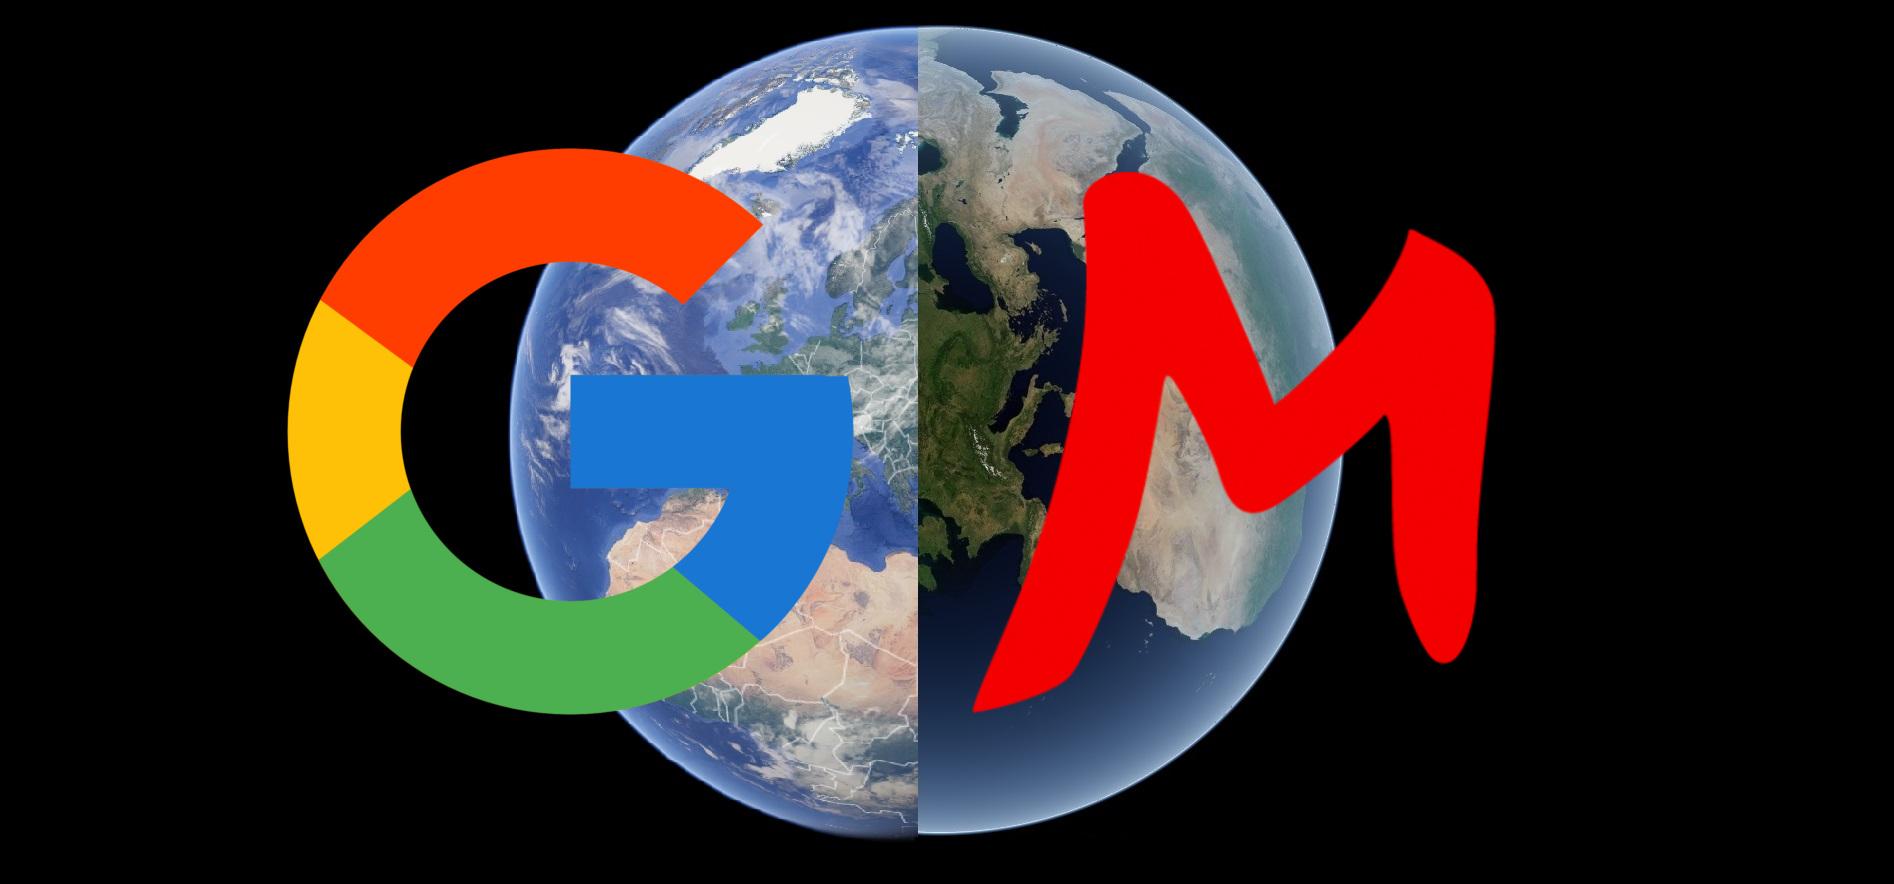 Seznam Zkvalitnil Sve 3d Mapy Nabizi Lepsi Zobrazeni Nez Google